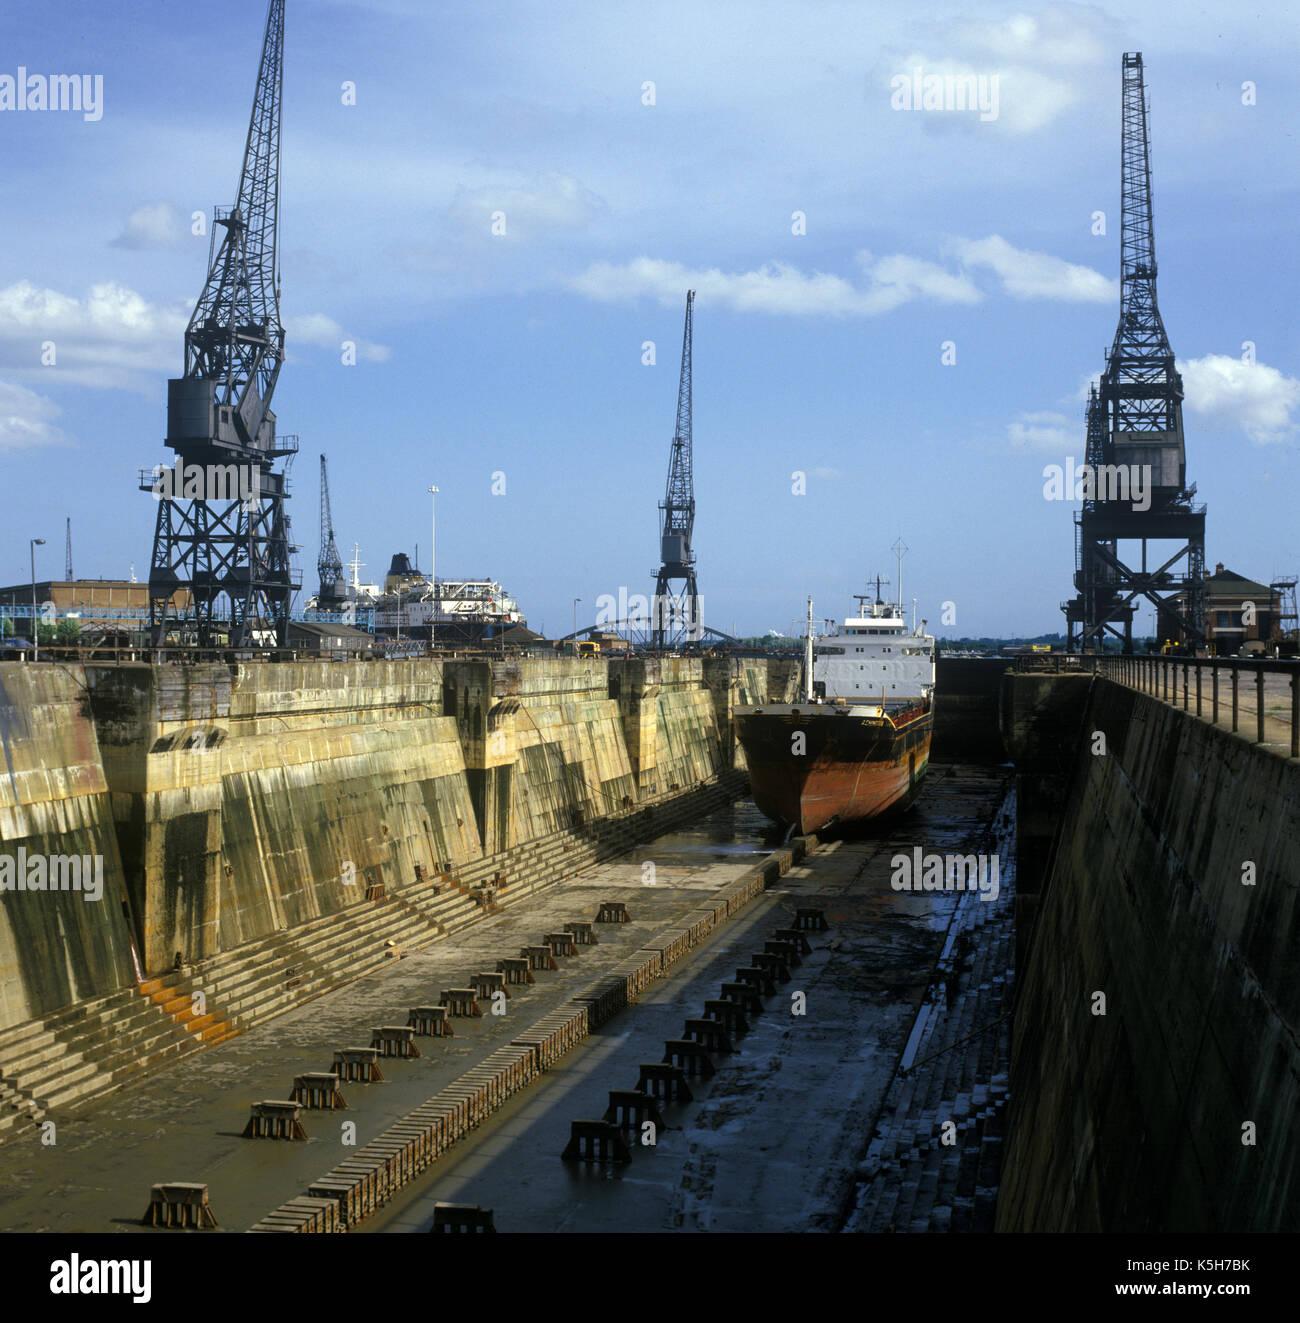 King George V graving dock (dry dock) Port of Southampton, Southampton Docks, Southampton, Hampshire, England, UK. - Stock Image